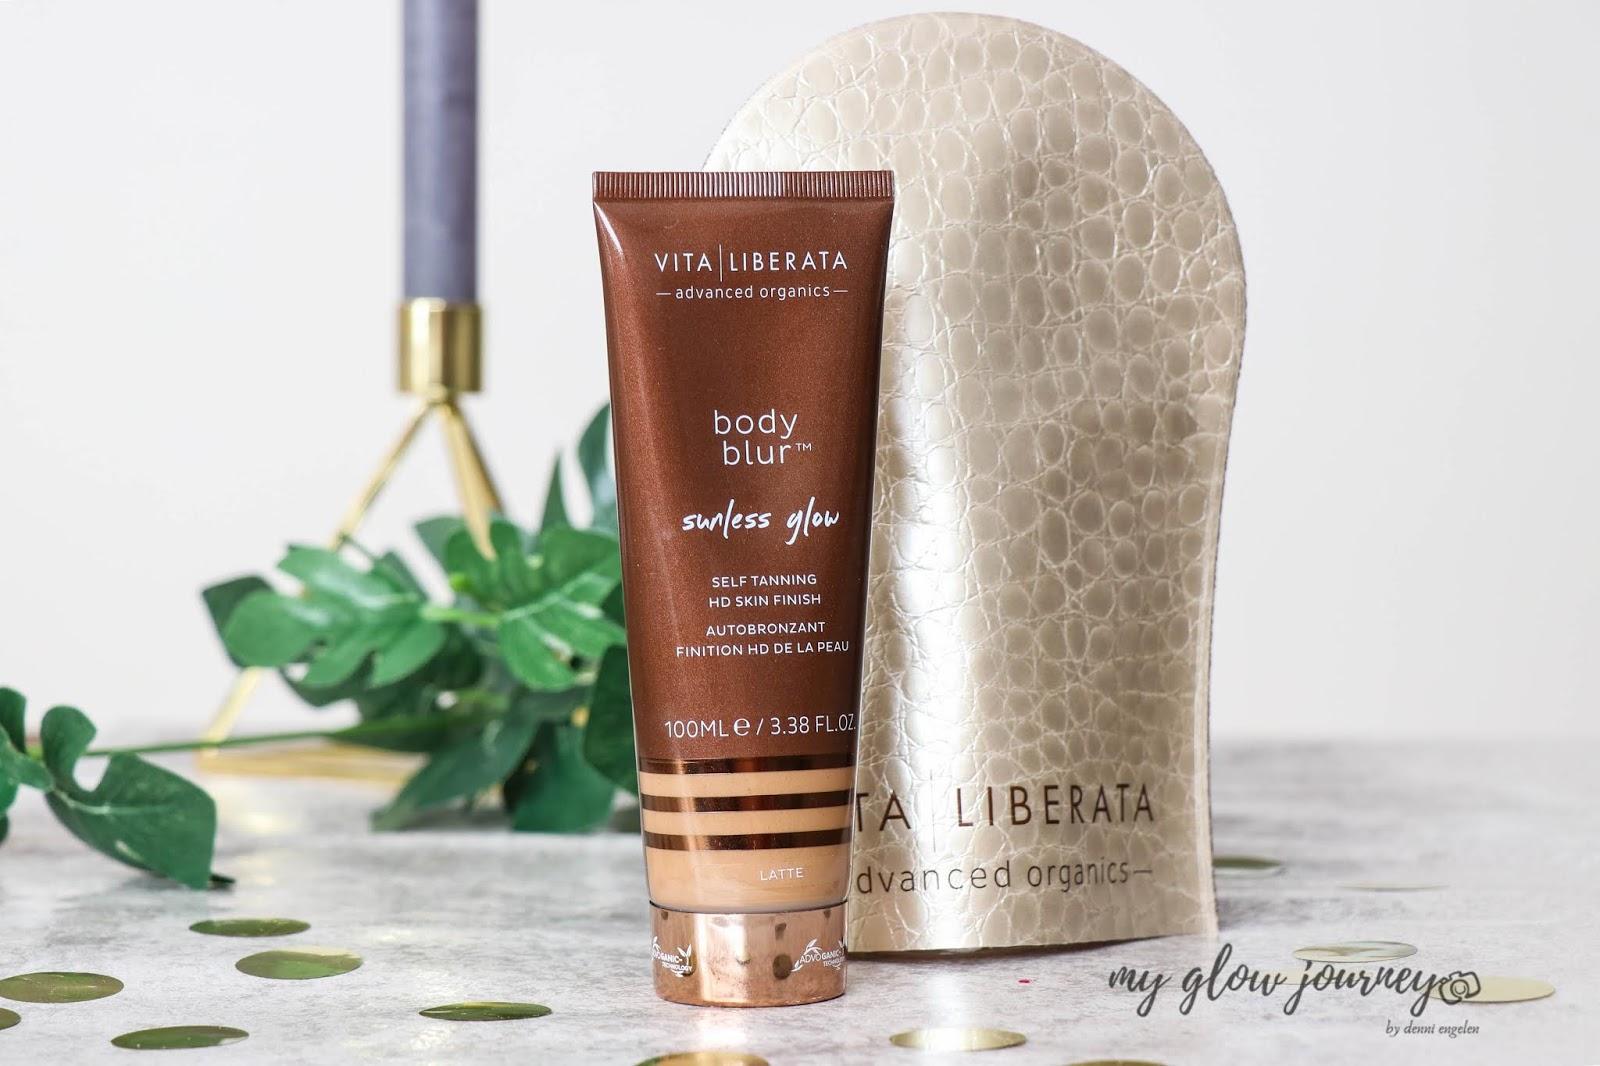 Vita Liberata Body Blur Sunless Glow Review and Demo